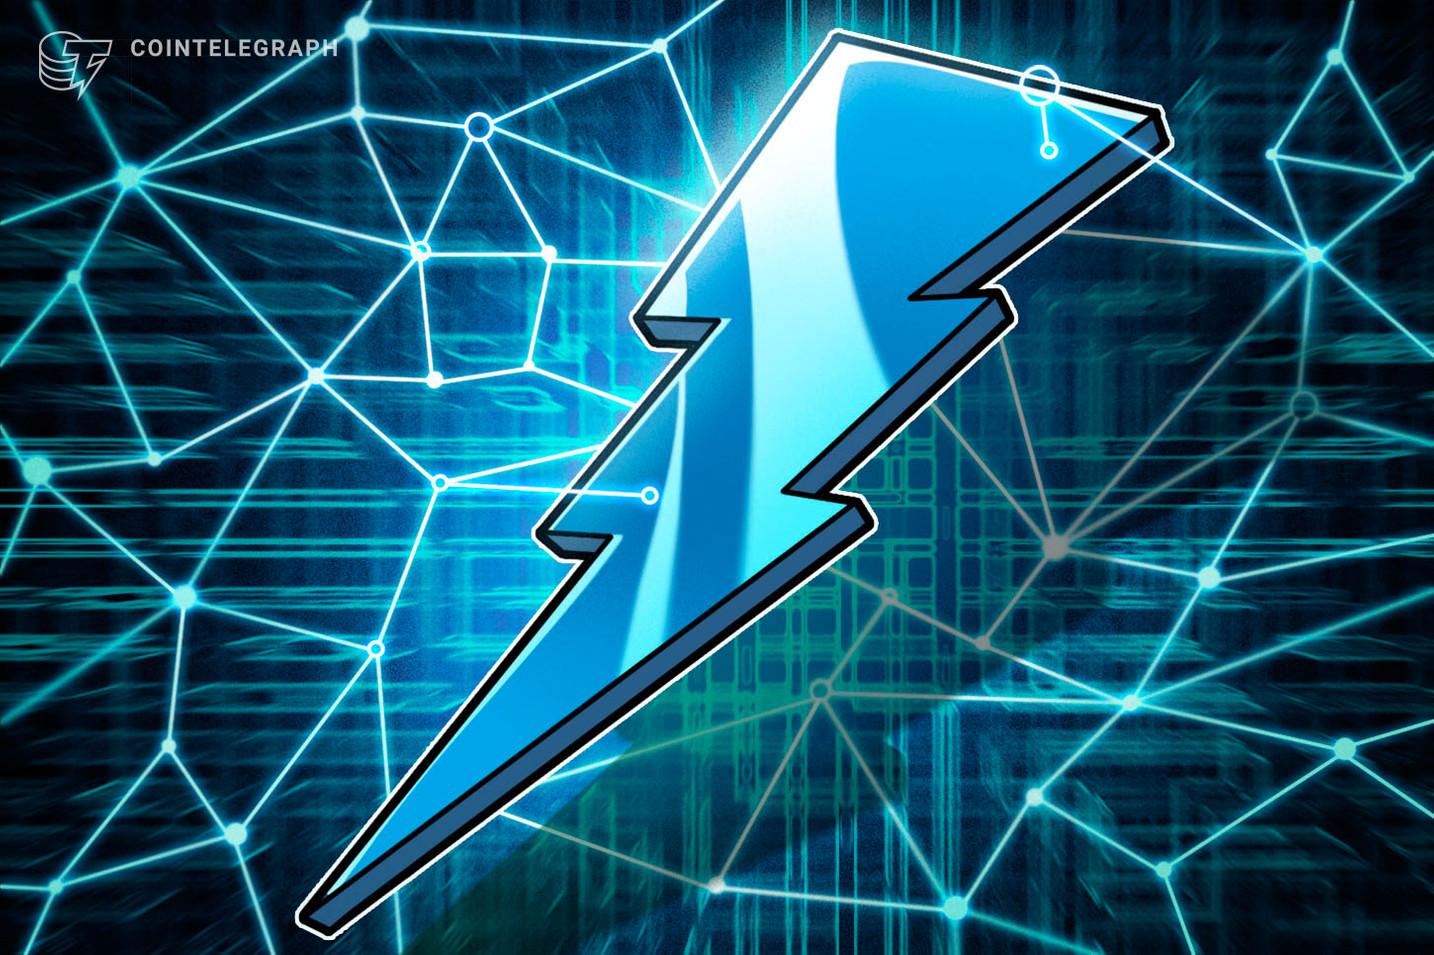 Bitfinex'ten Bitcoin Bech32'ye Destek, Lightning Network'e Yeşil Işık